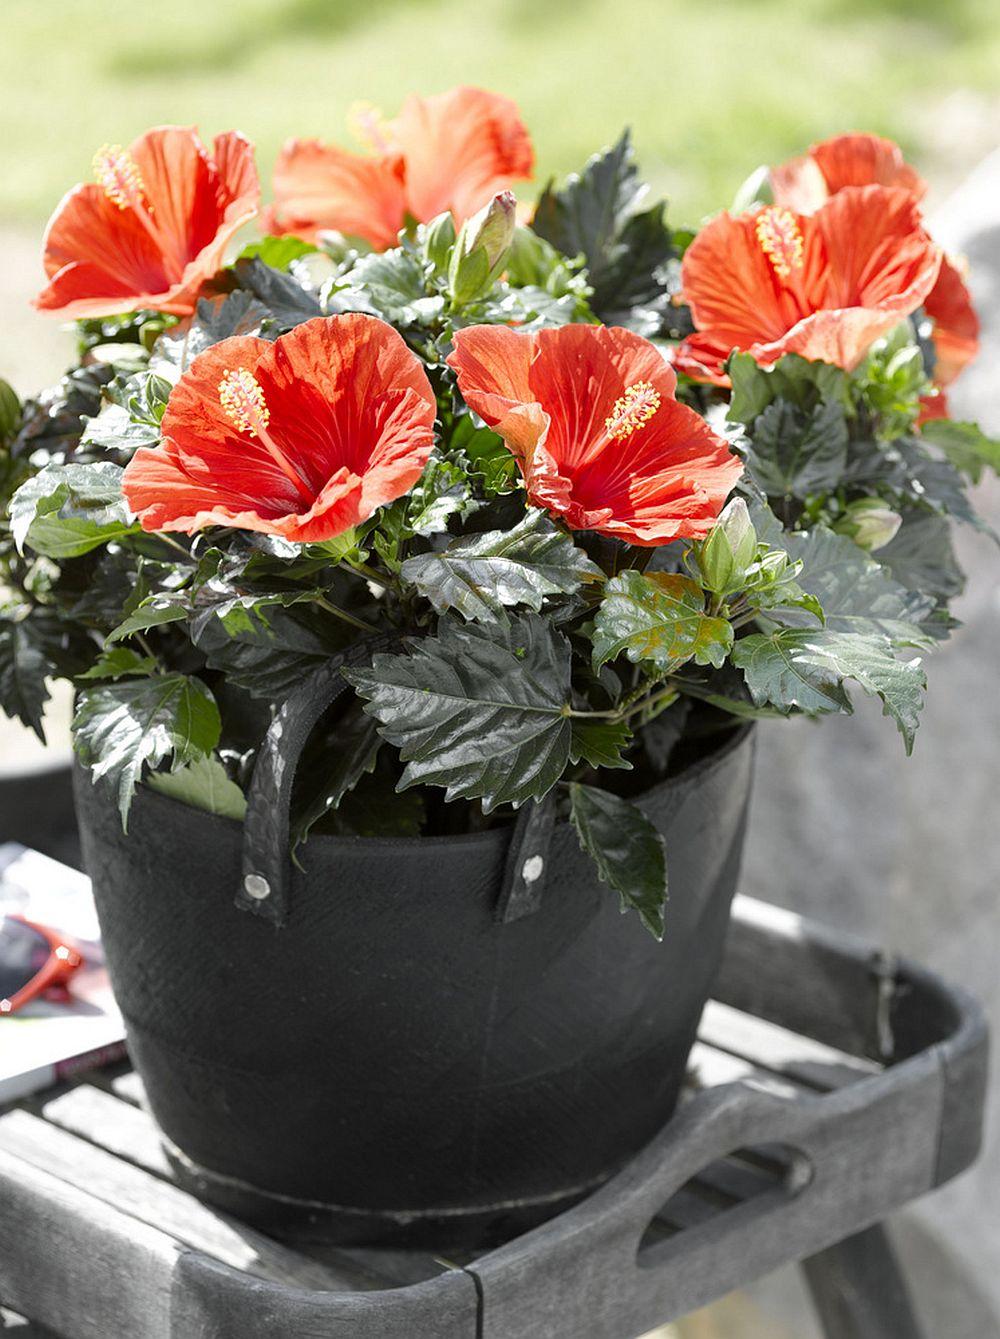 adelaparvu.com despre trandafirul japonez, trandafirul chinezesc, Hibiscus, text Carli Marian, Foto Floradania (4)